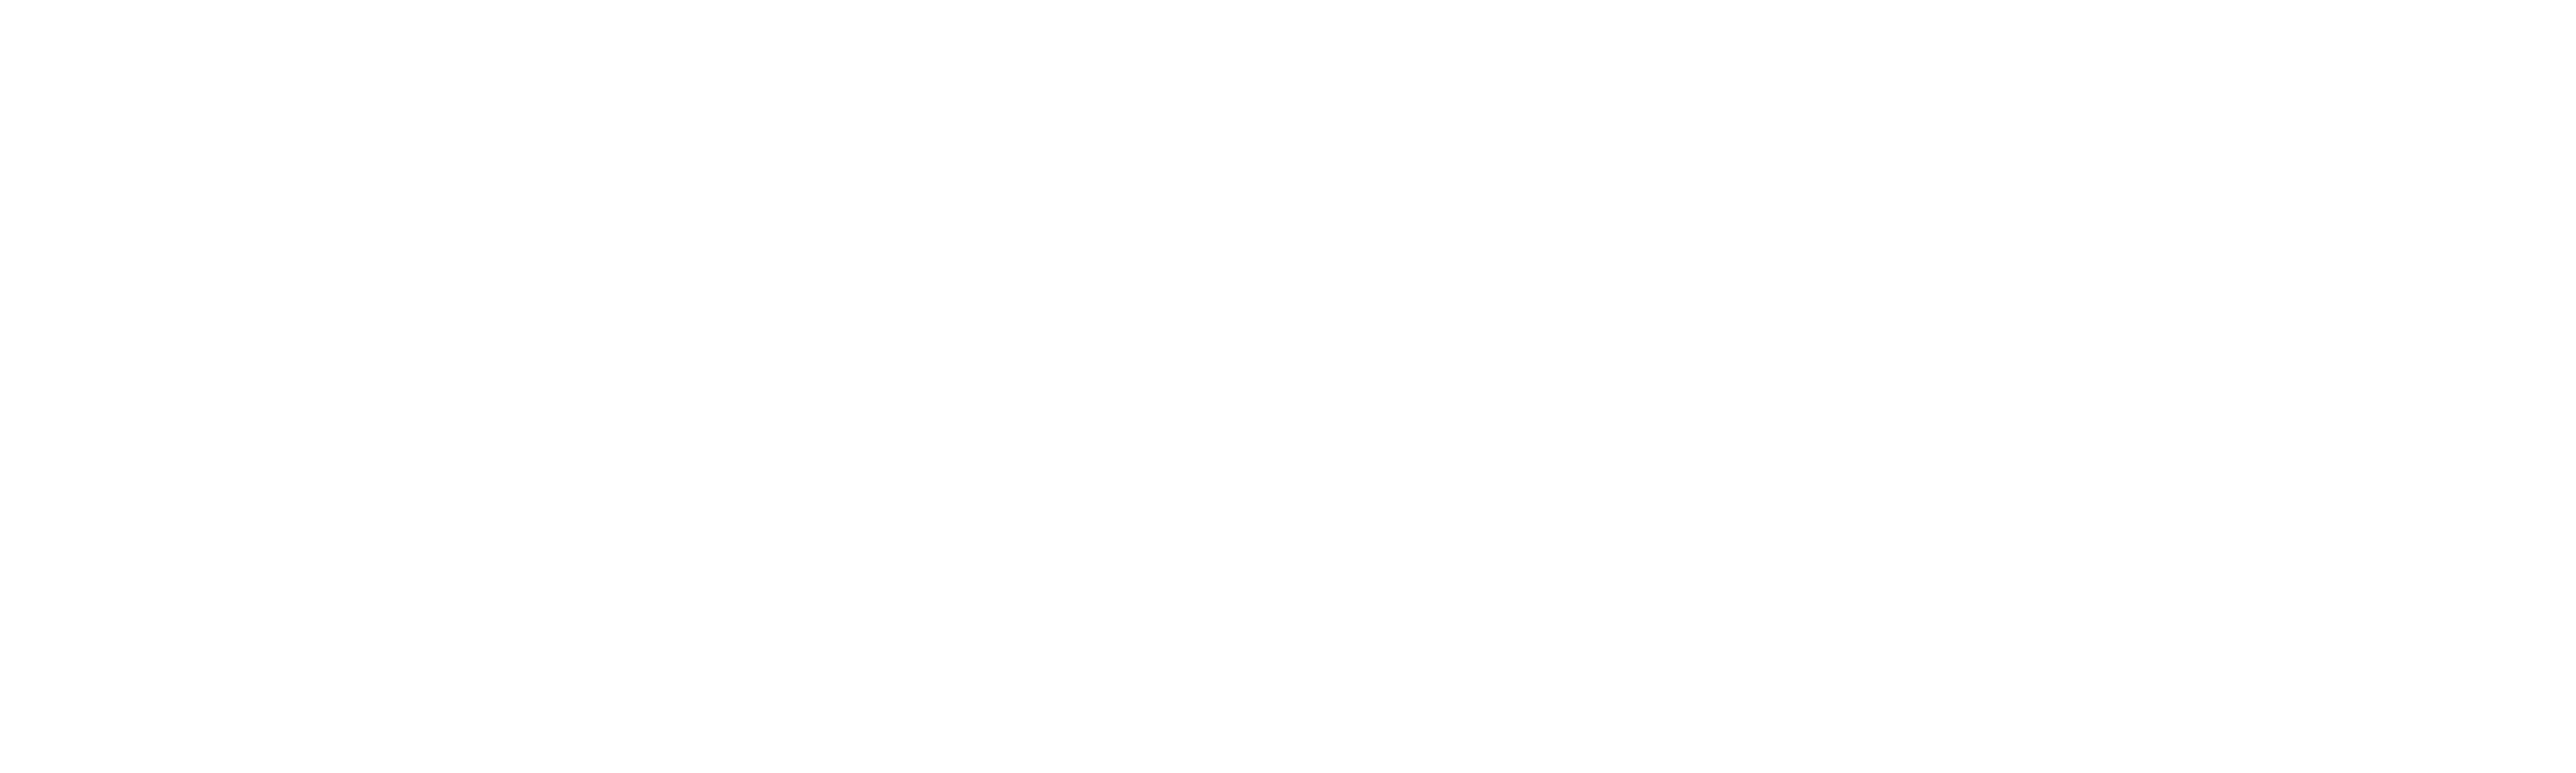 Jason Coosner